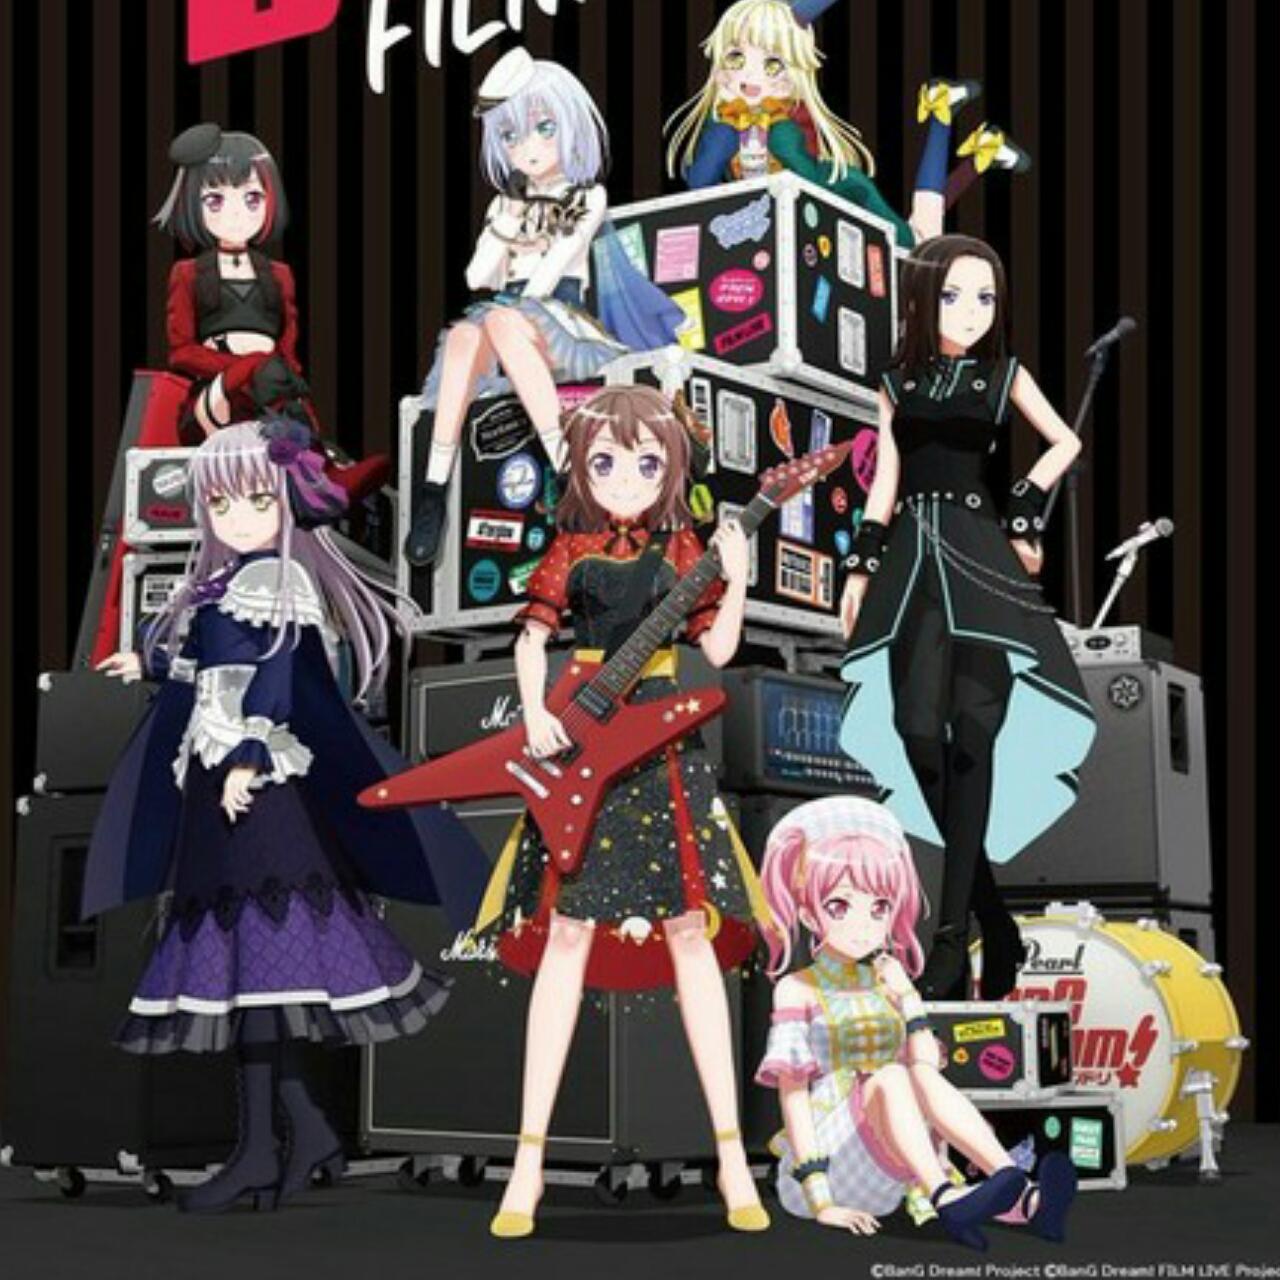 Film Anime BanG Dream! FILM LIVE 2nd Stage dan Episode of Roselia I: Yakusoku Ungkap Video Promosi 1